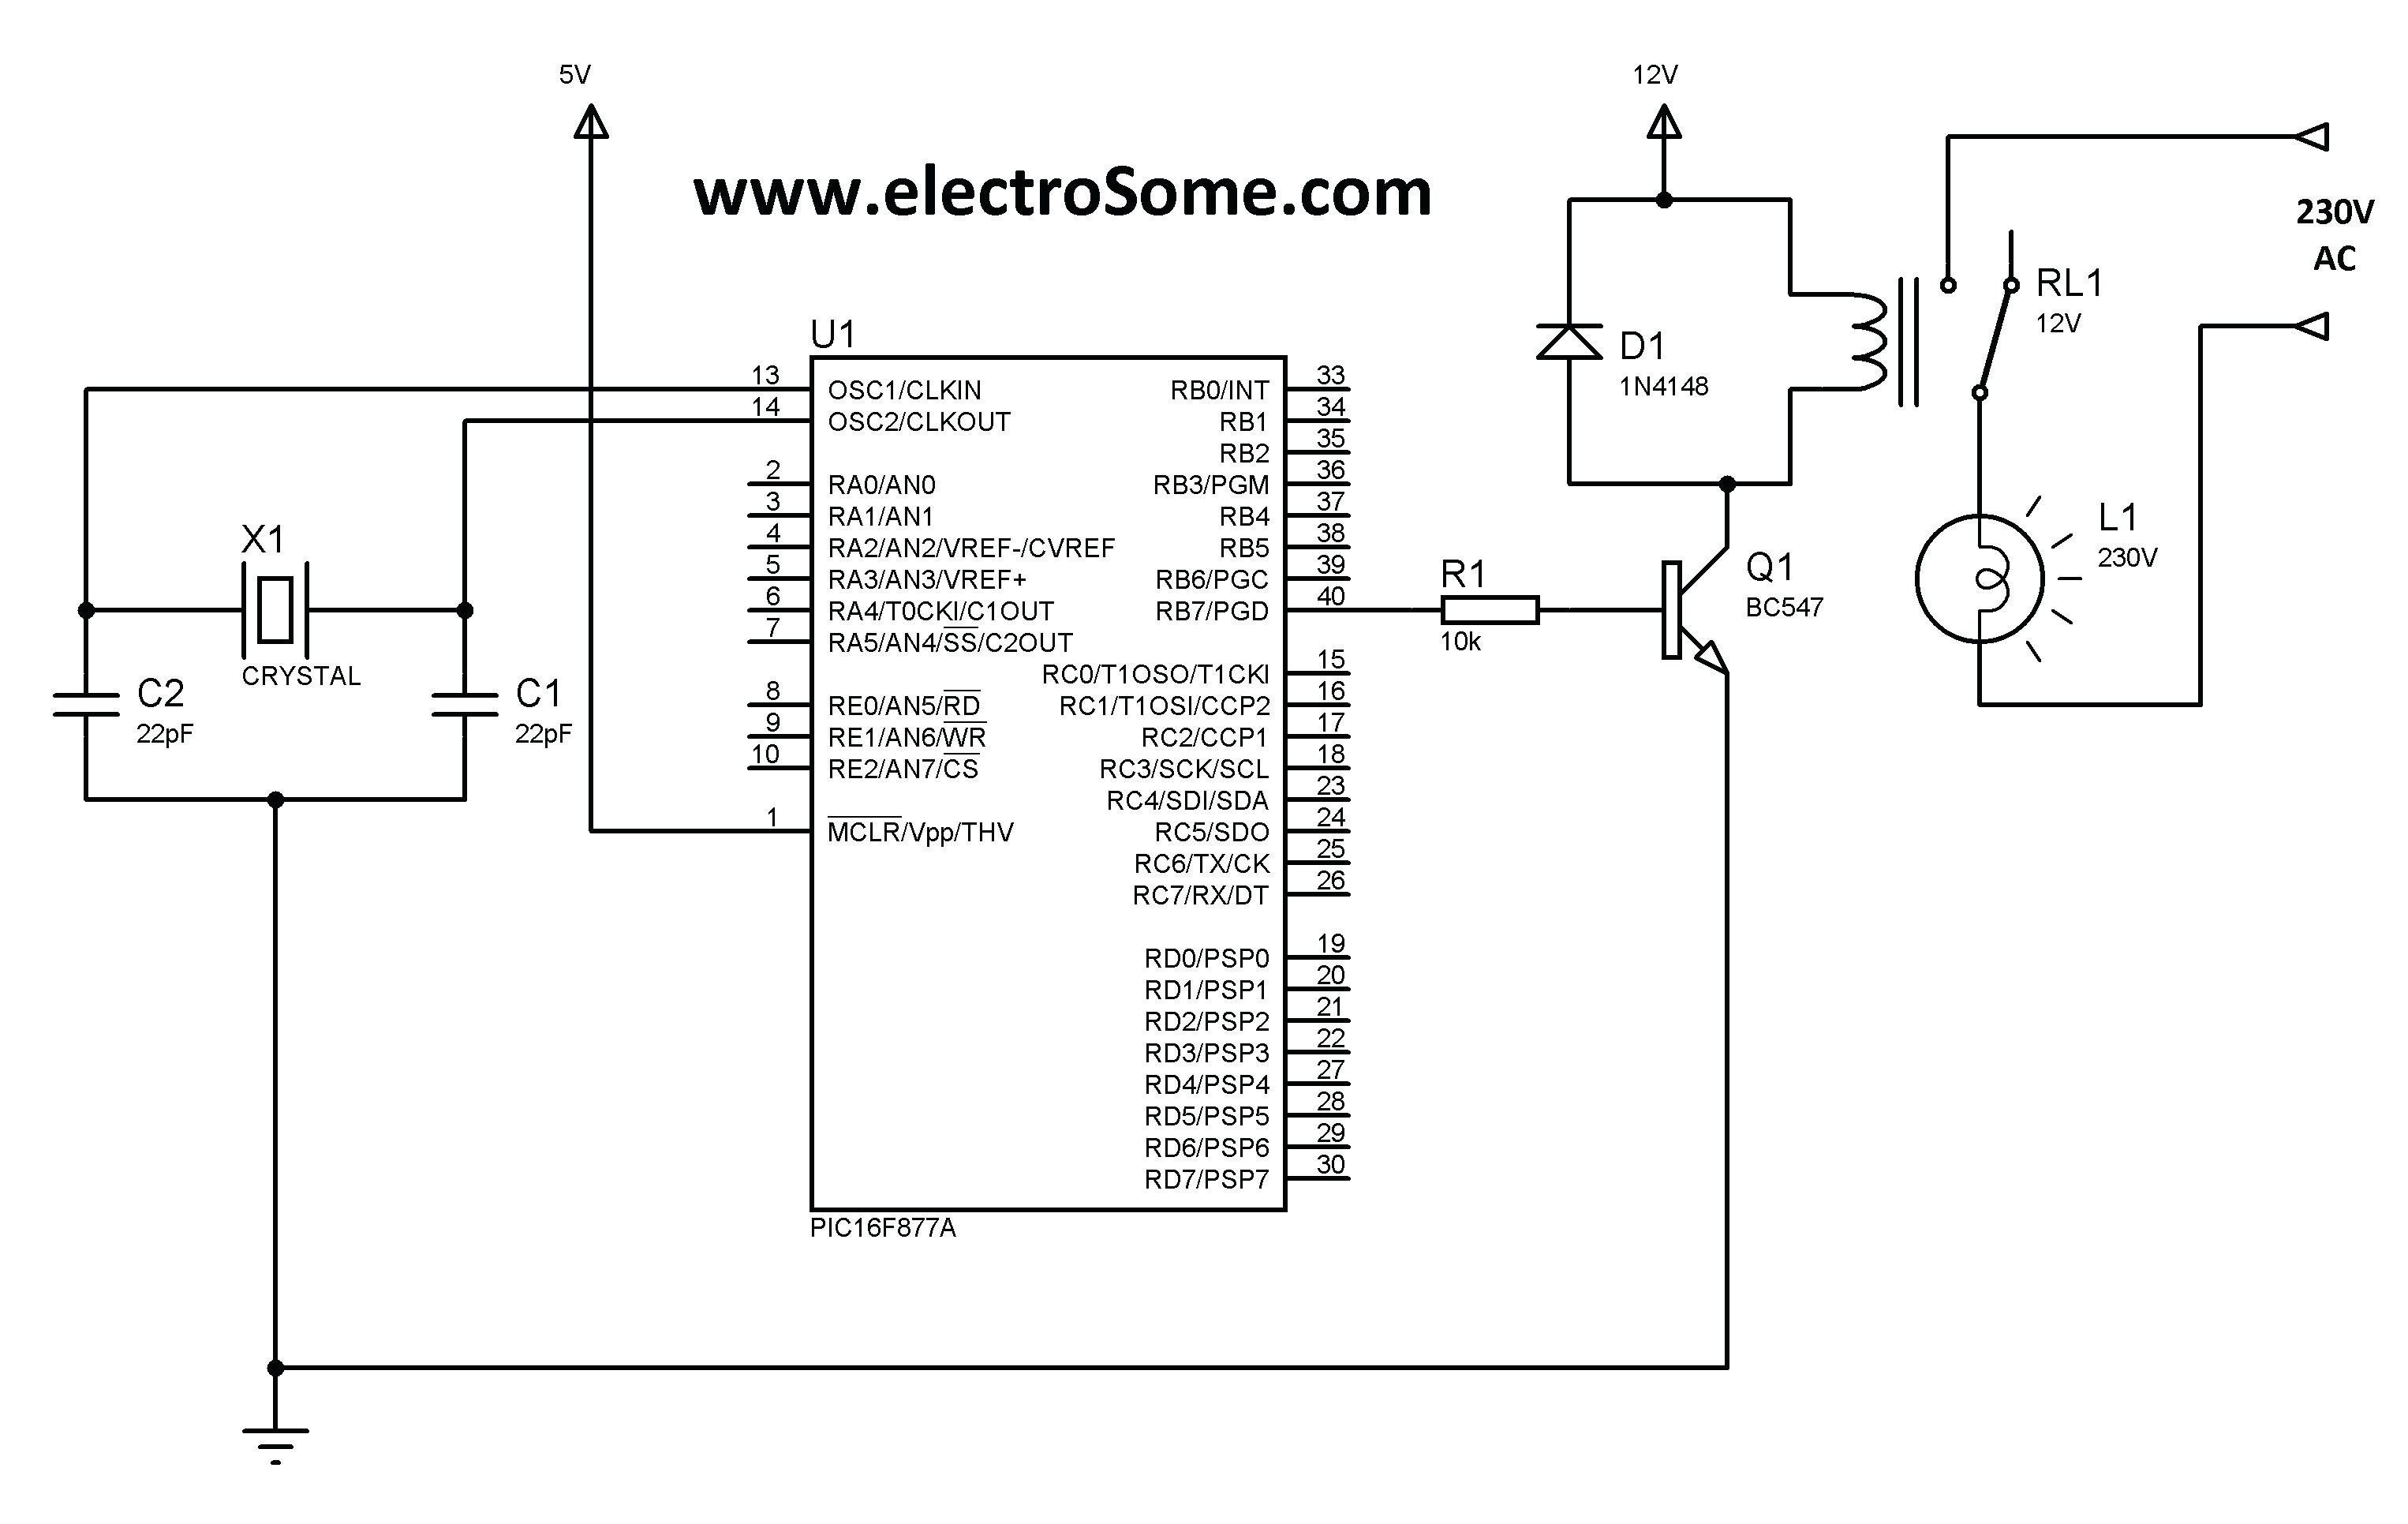 New Contactor Wiring Diagram Ac Unit Diagramsample